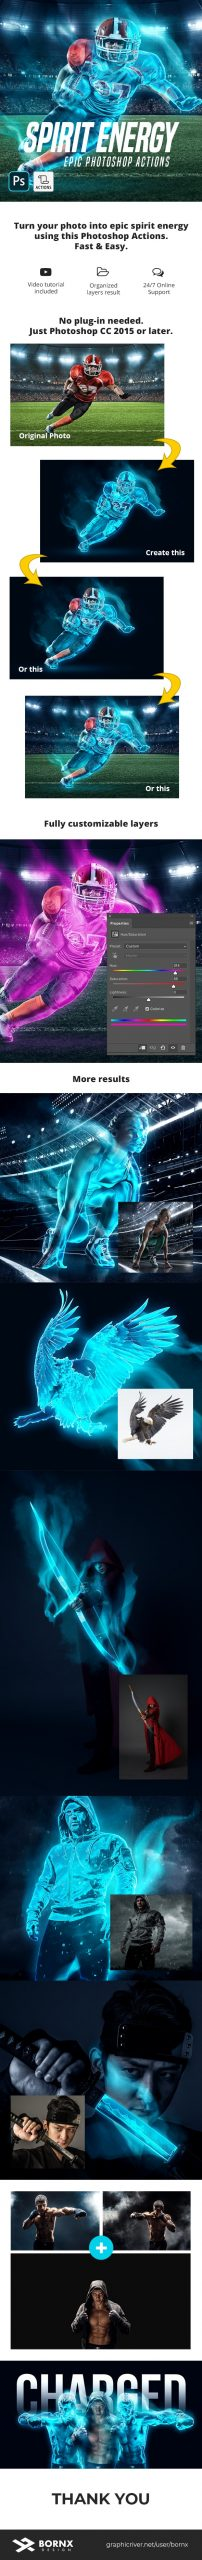 دانلود اکشن فتوشاپ Spirit Energy